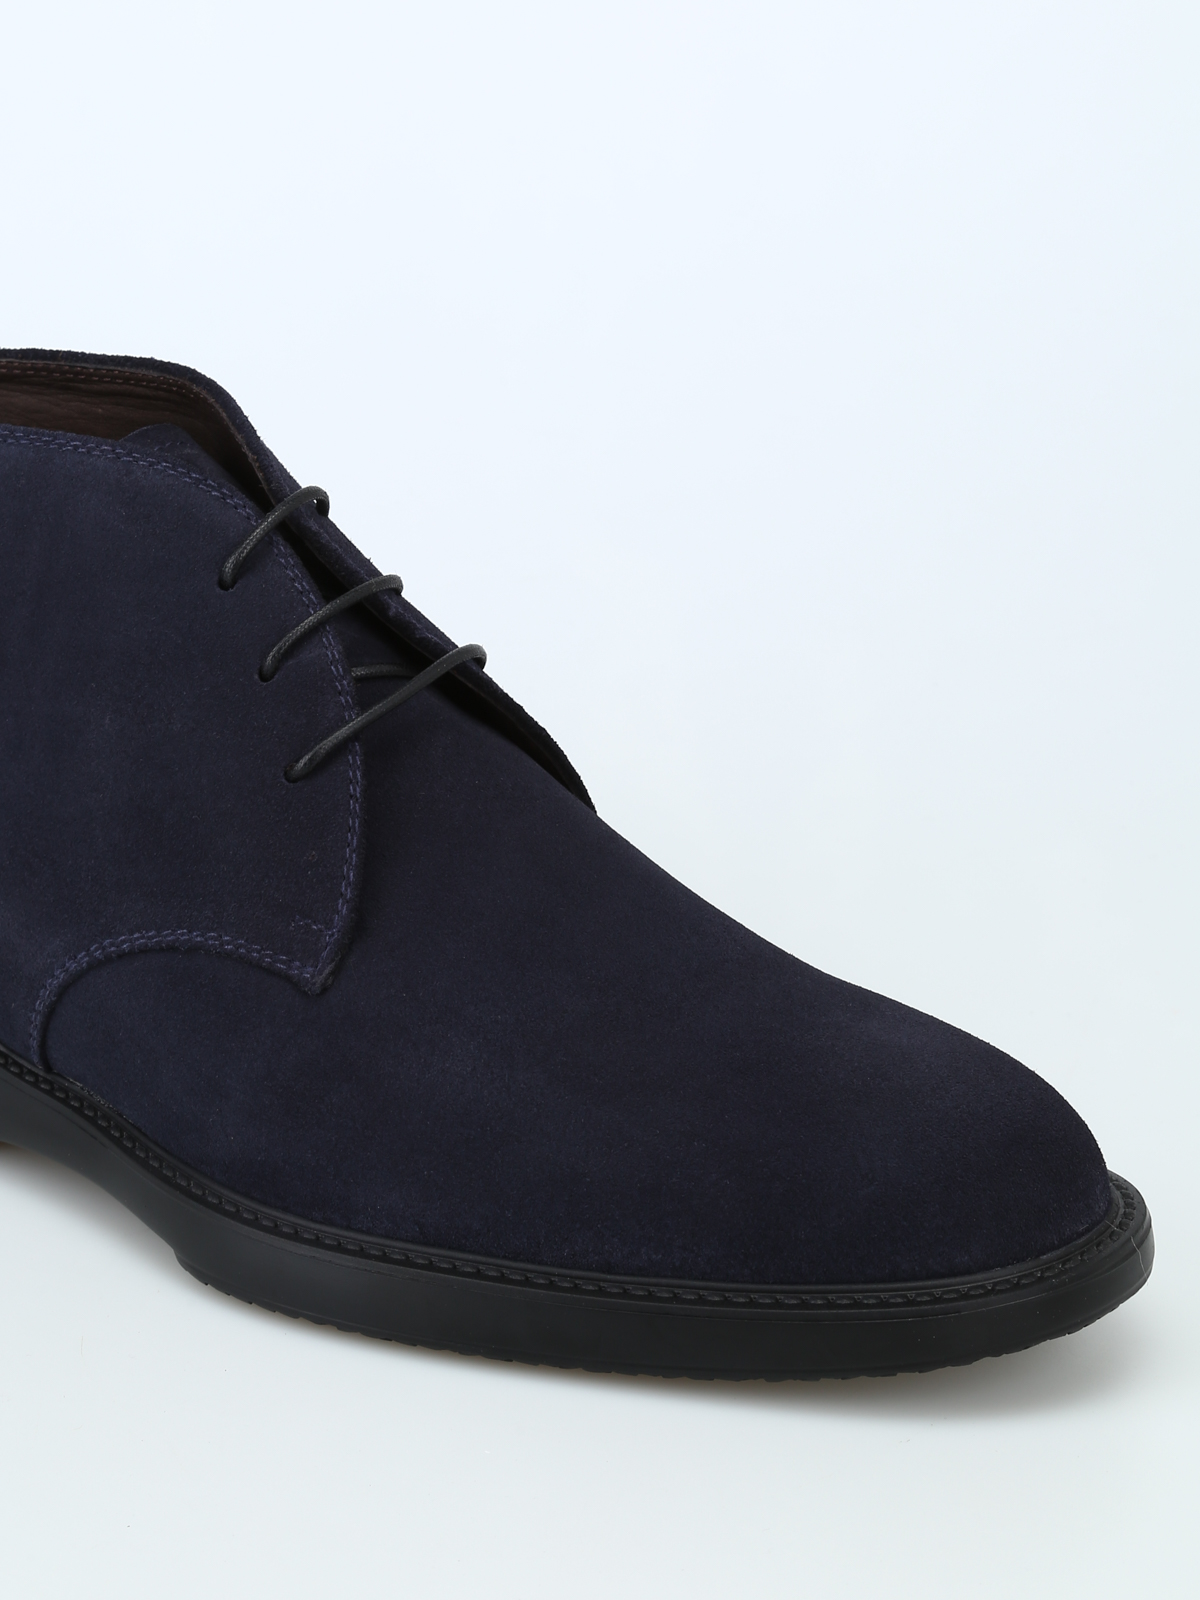 Barrett - Blue suede desert boots with